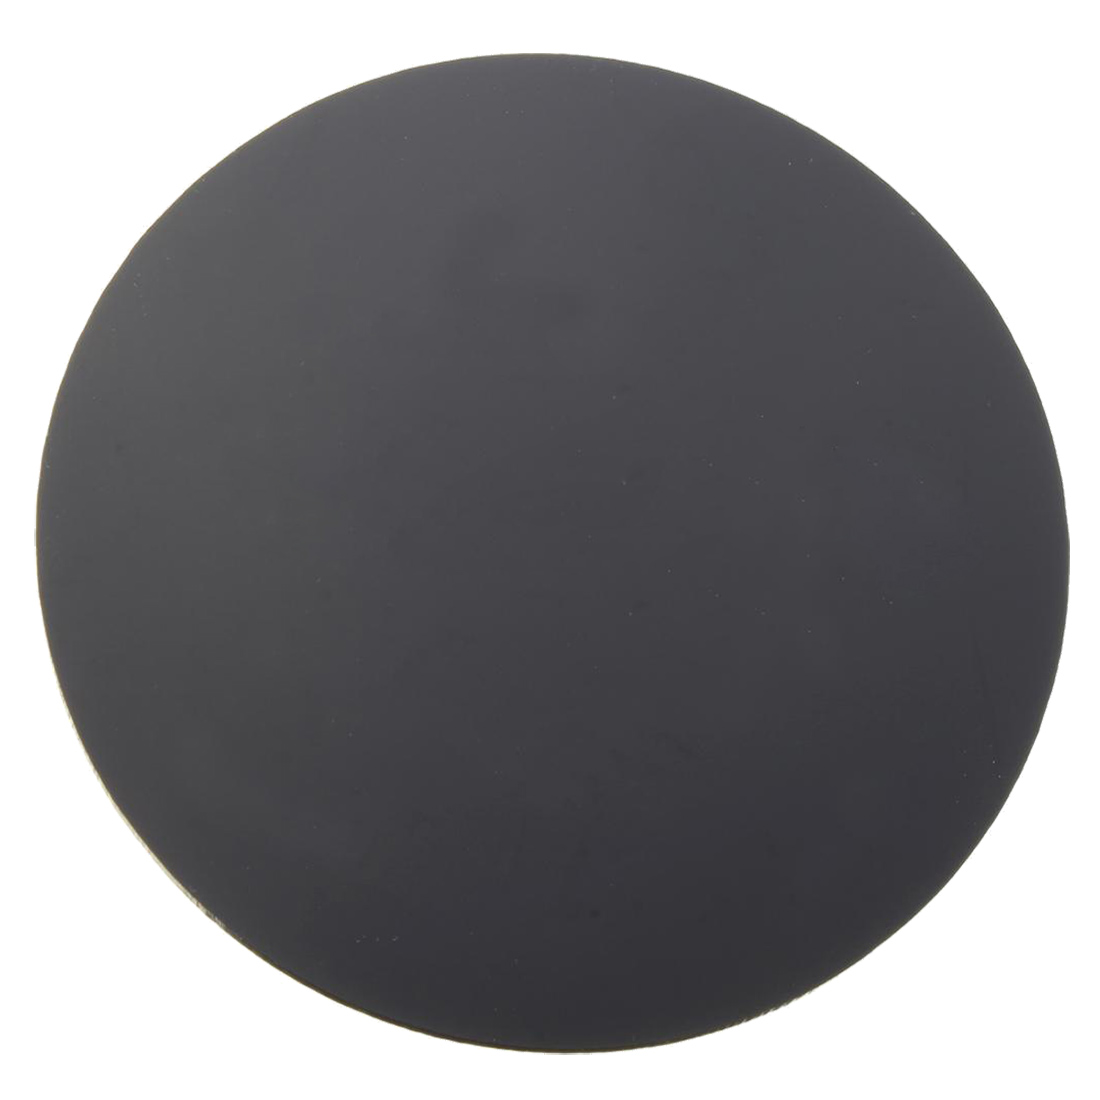 3mm Thick Mirror Acrylic Round Sheet Black Diameter 100mm